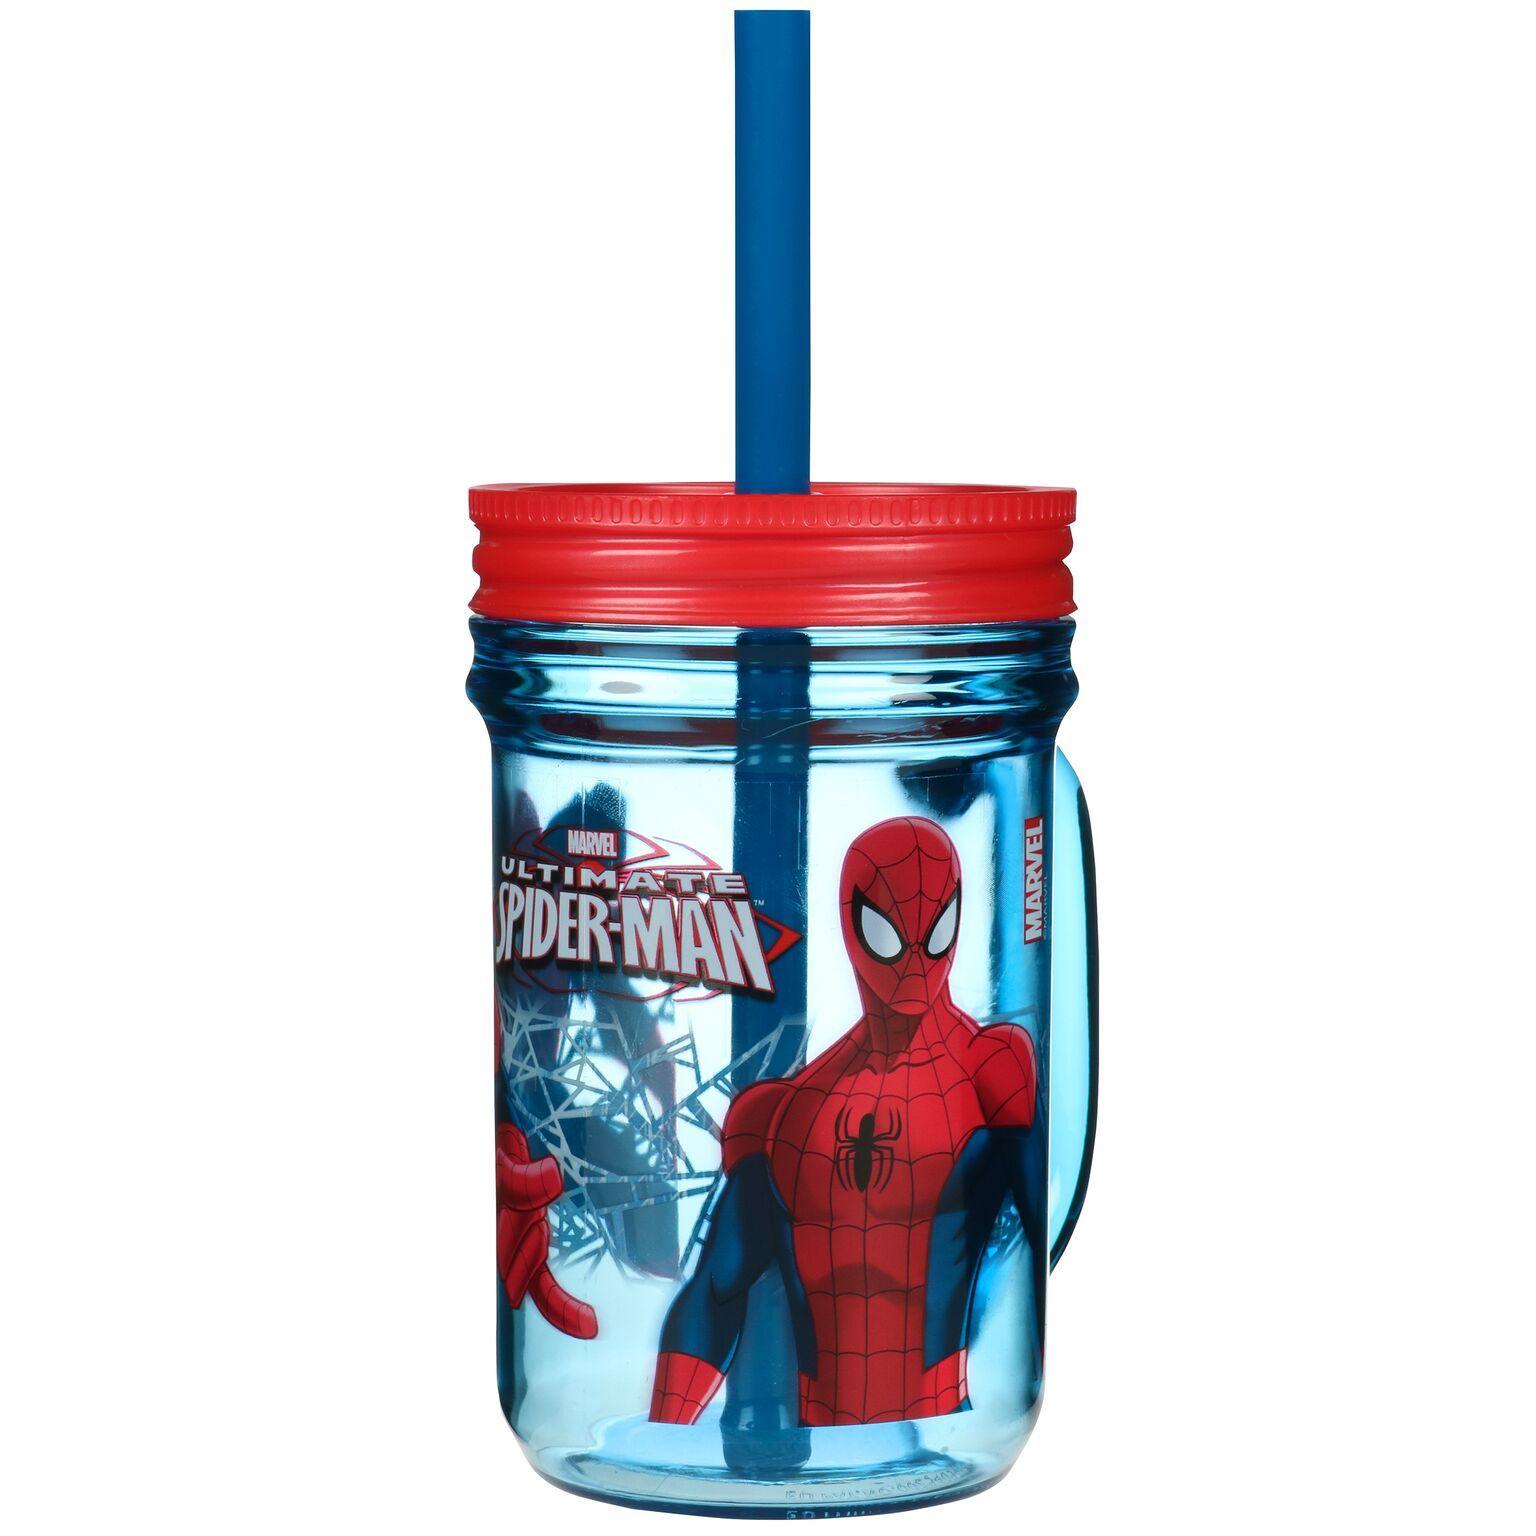 Spiderman Mason Jar image